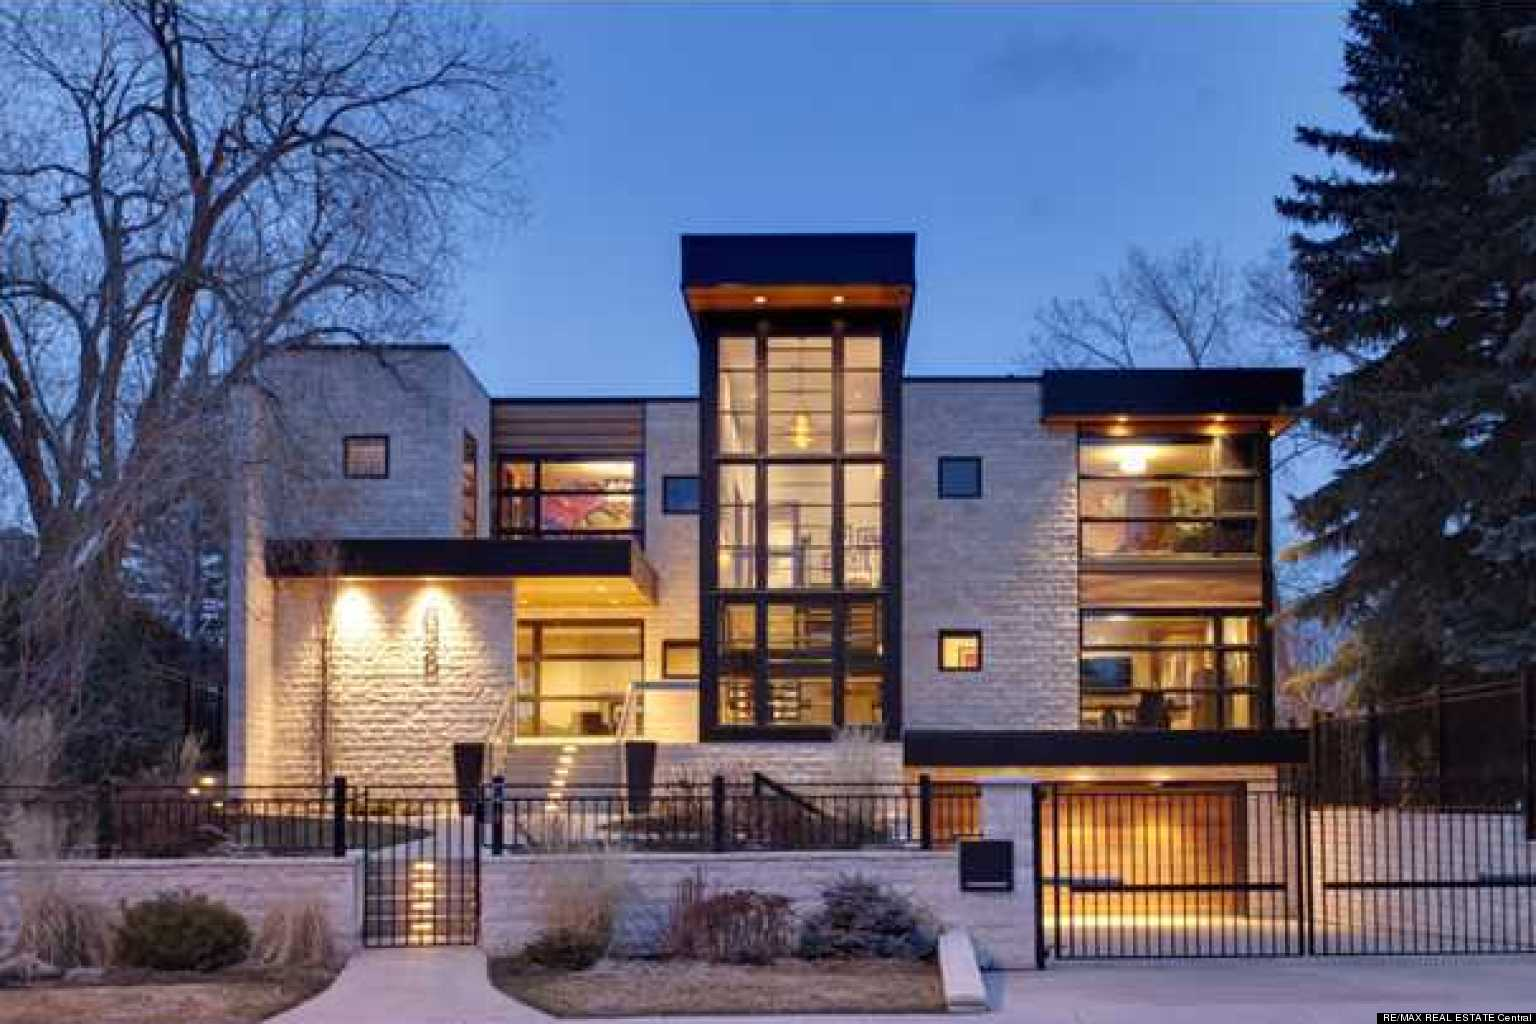 Mobile Homes For Sale Alberta >> Jarome Iginla's Calgary House For Sale For $3.9 Million ...